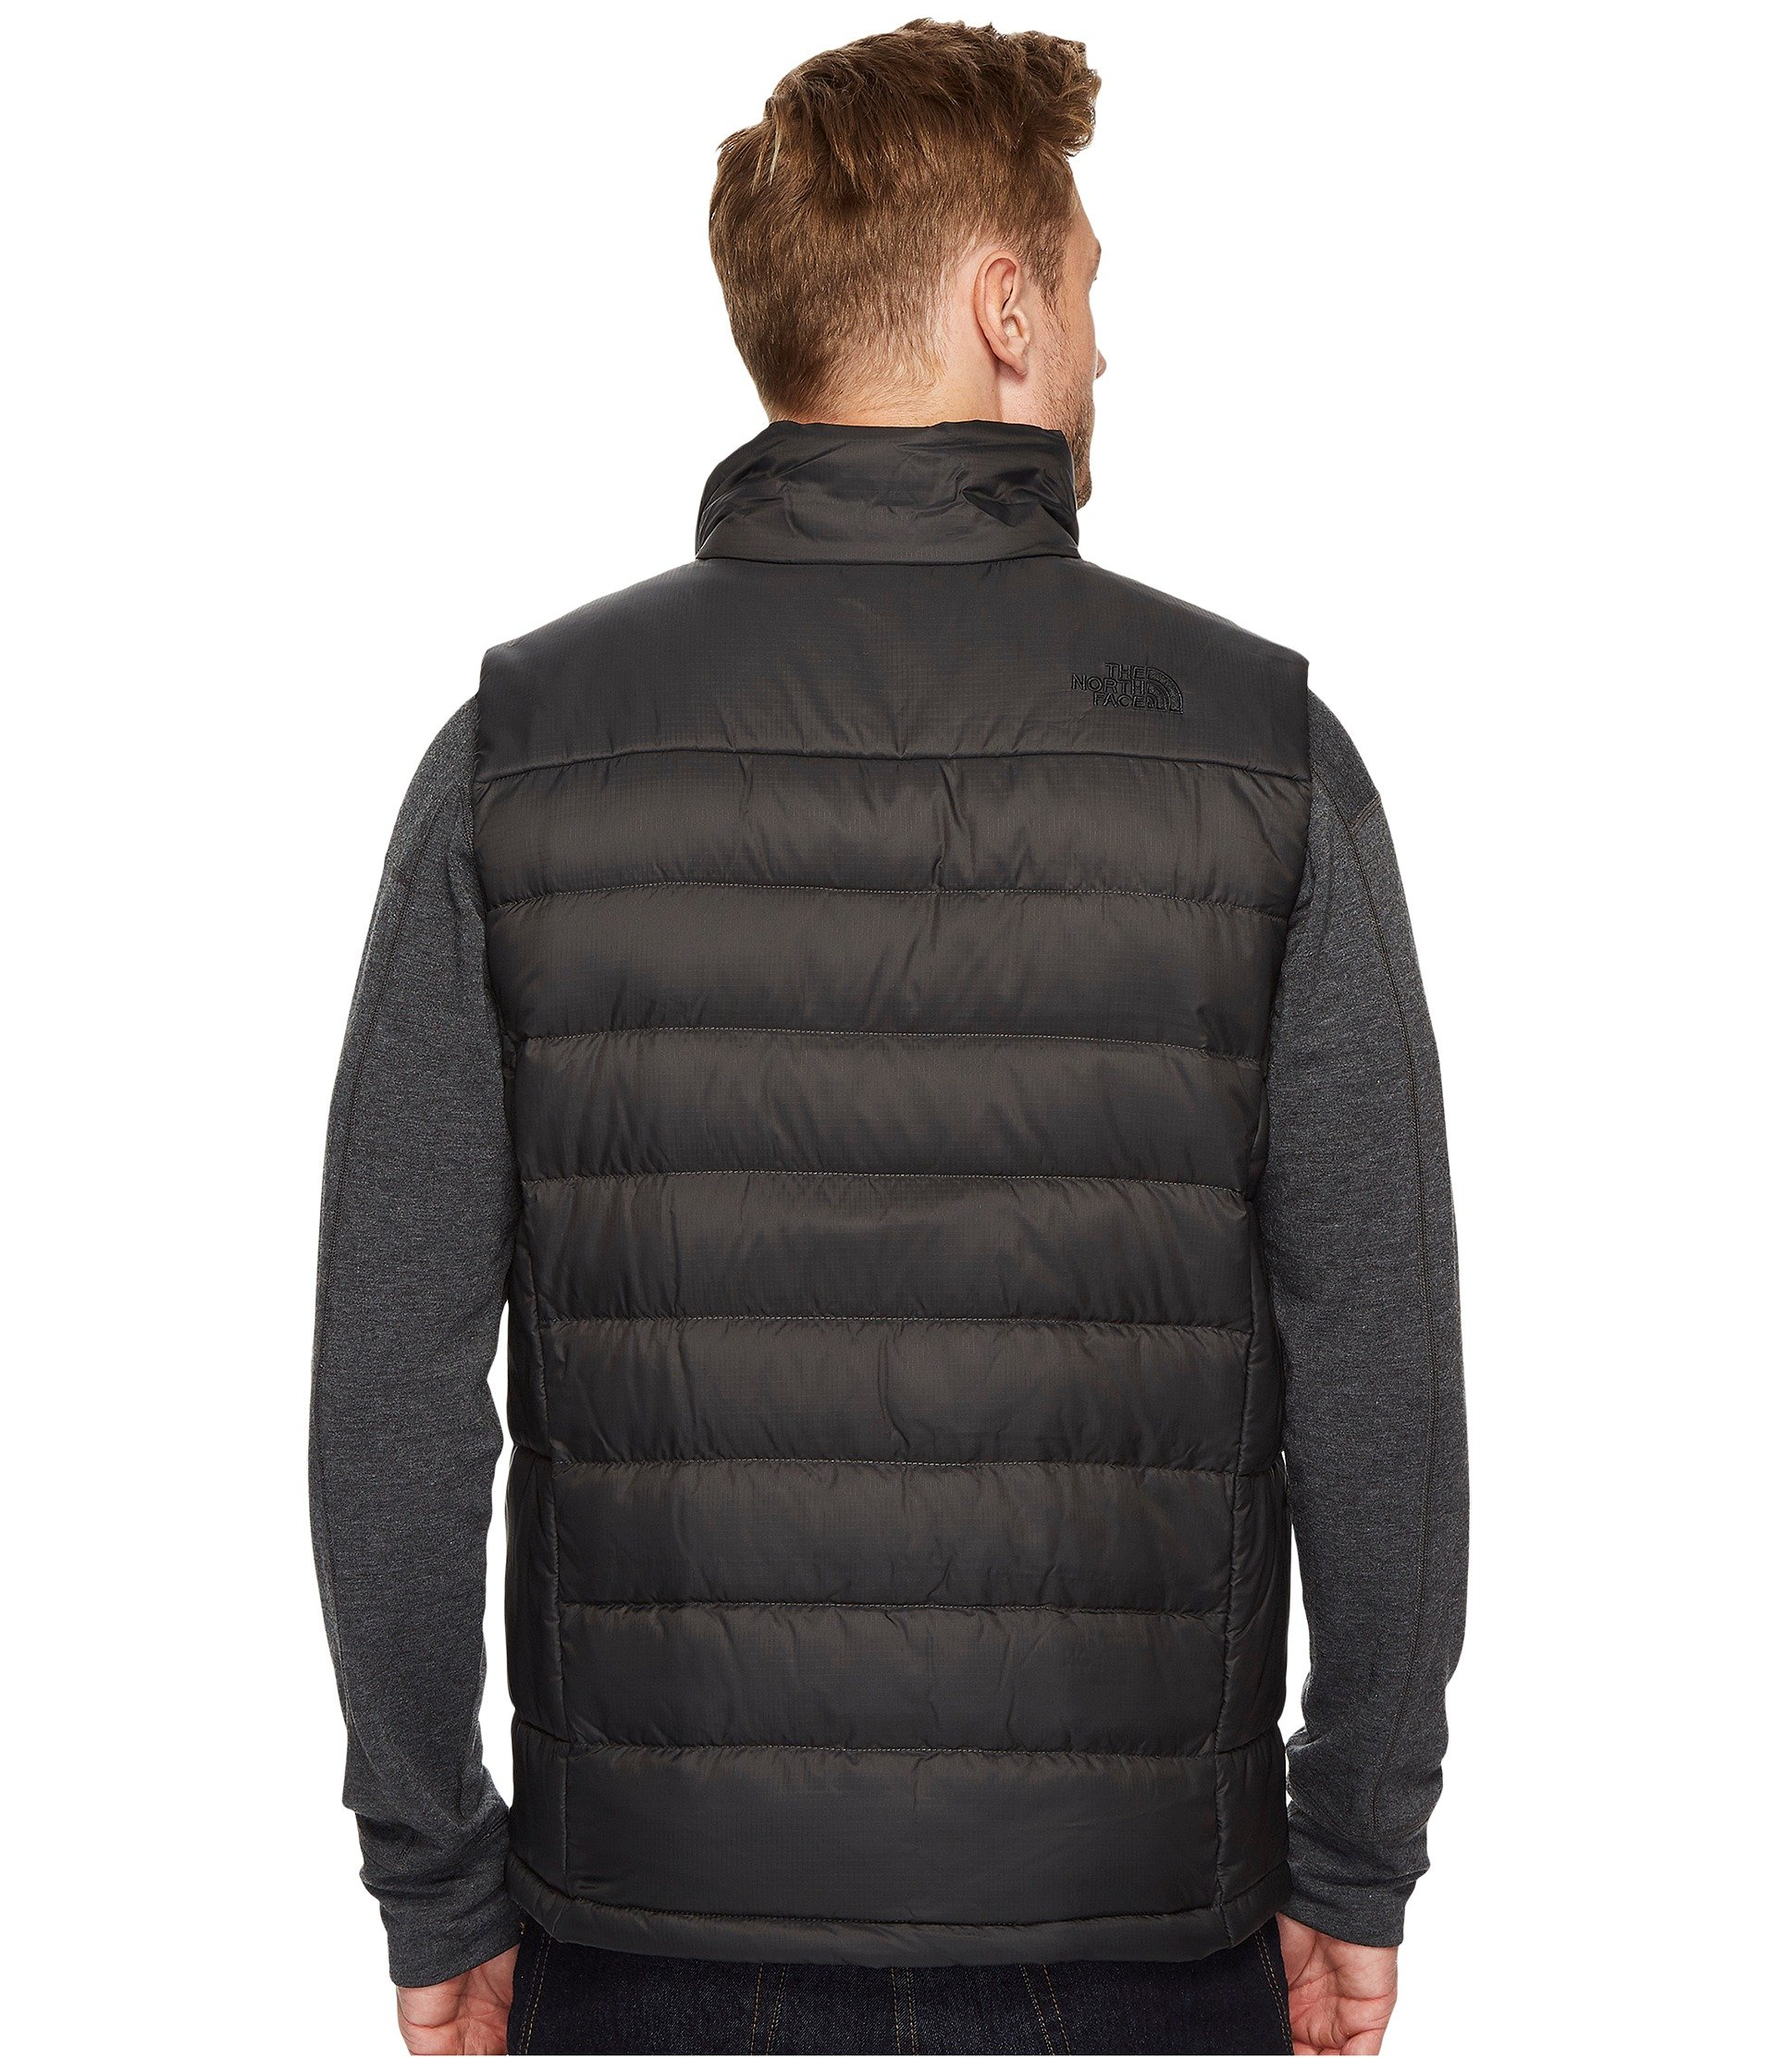 Vest Asphalt North Aconcagua The Face Grey wtSzxqzF